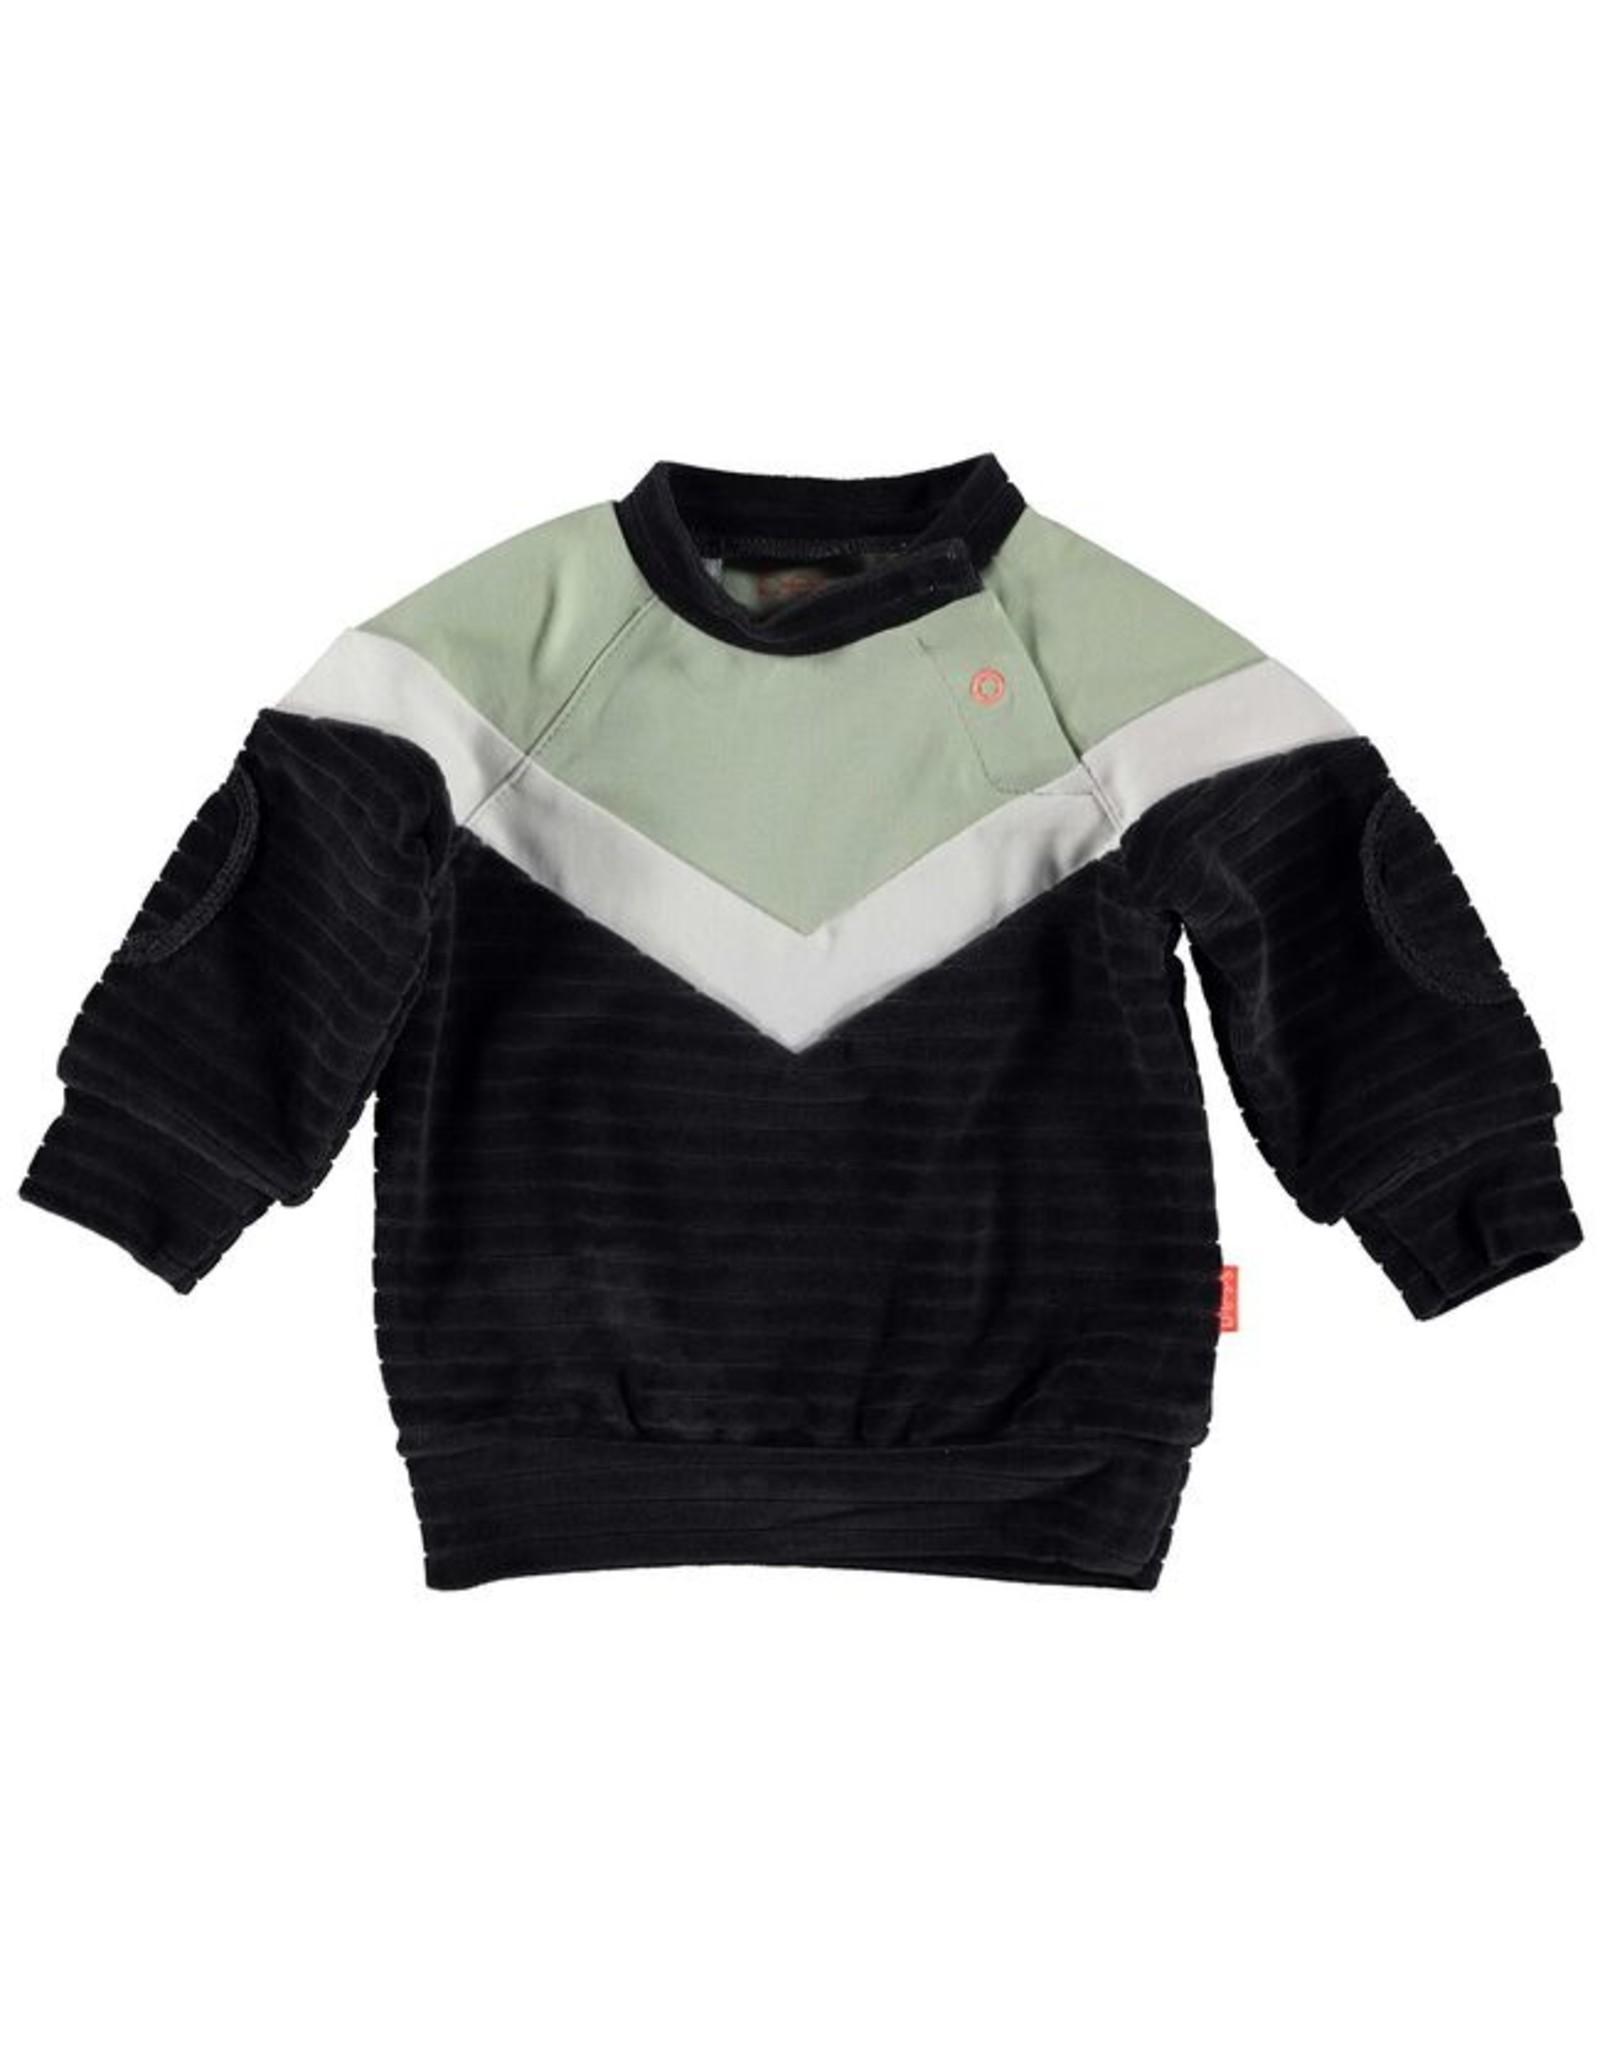 BESS BESS Sweater Velvet Colorblock Anthracite